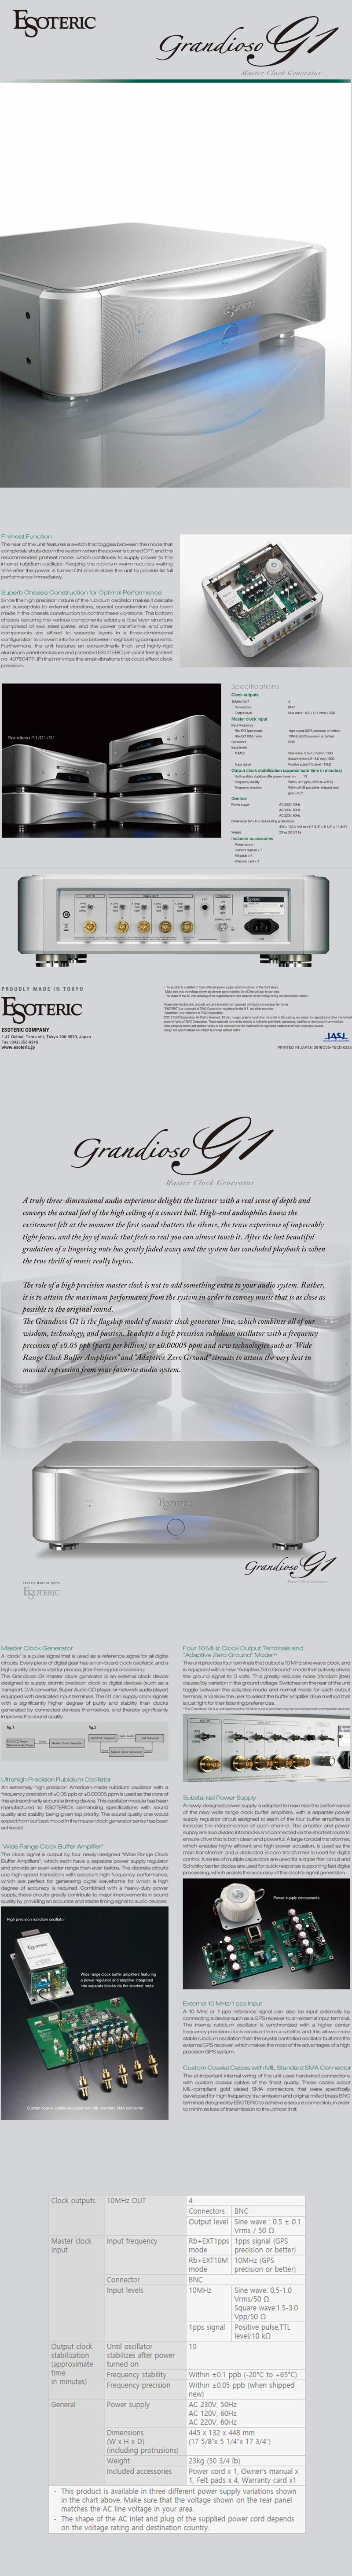 grandioso g1-1.jpg